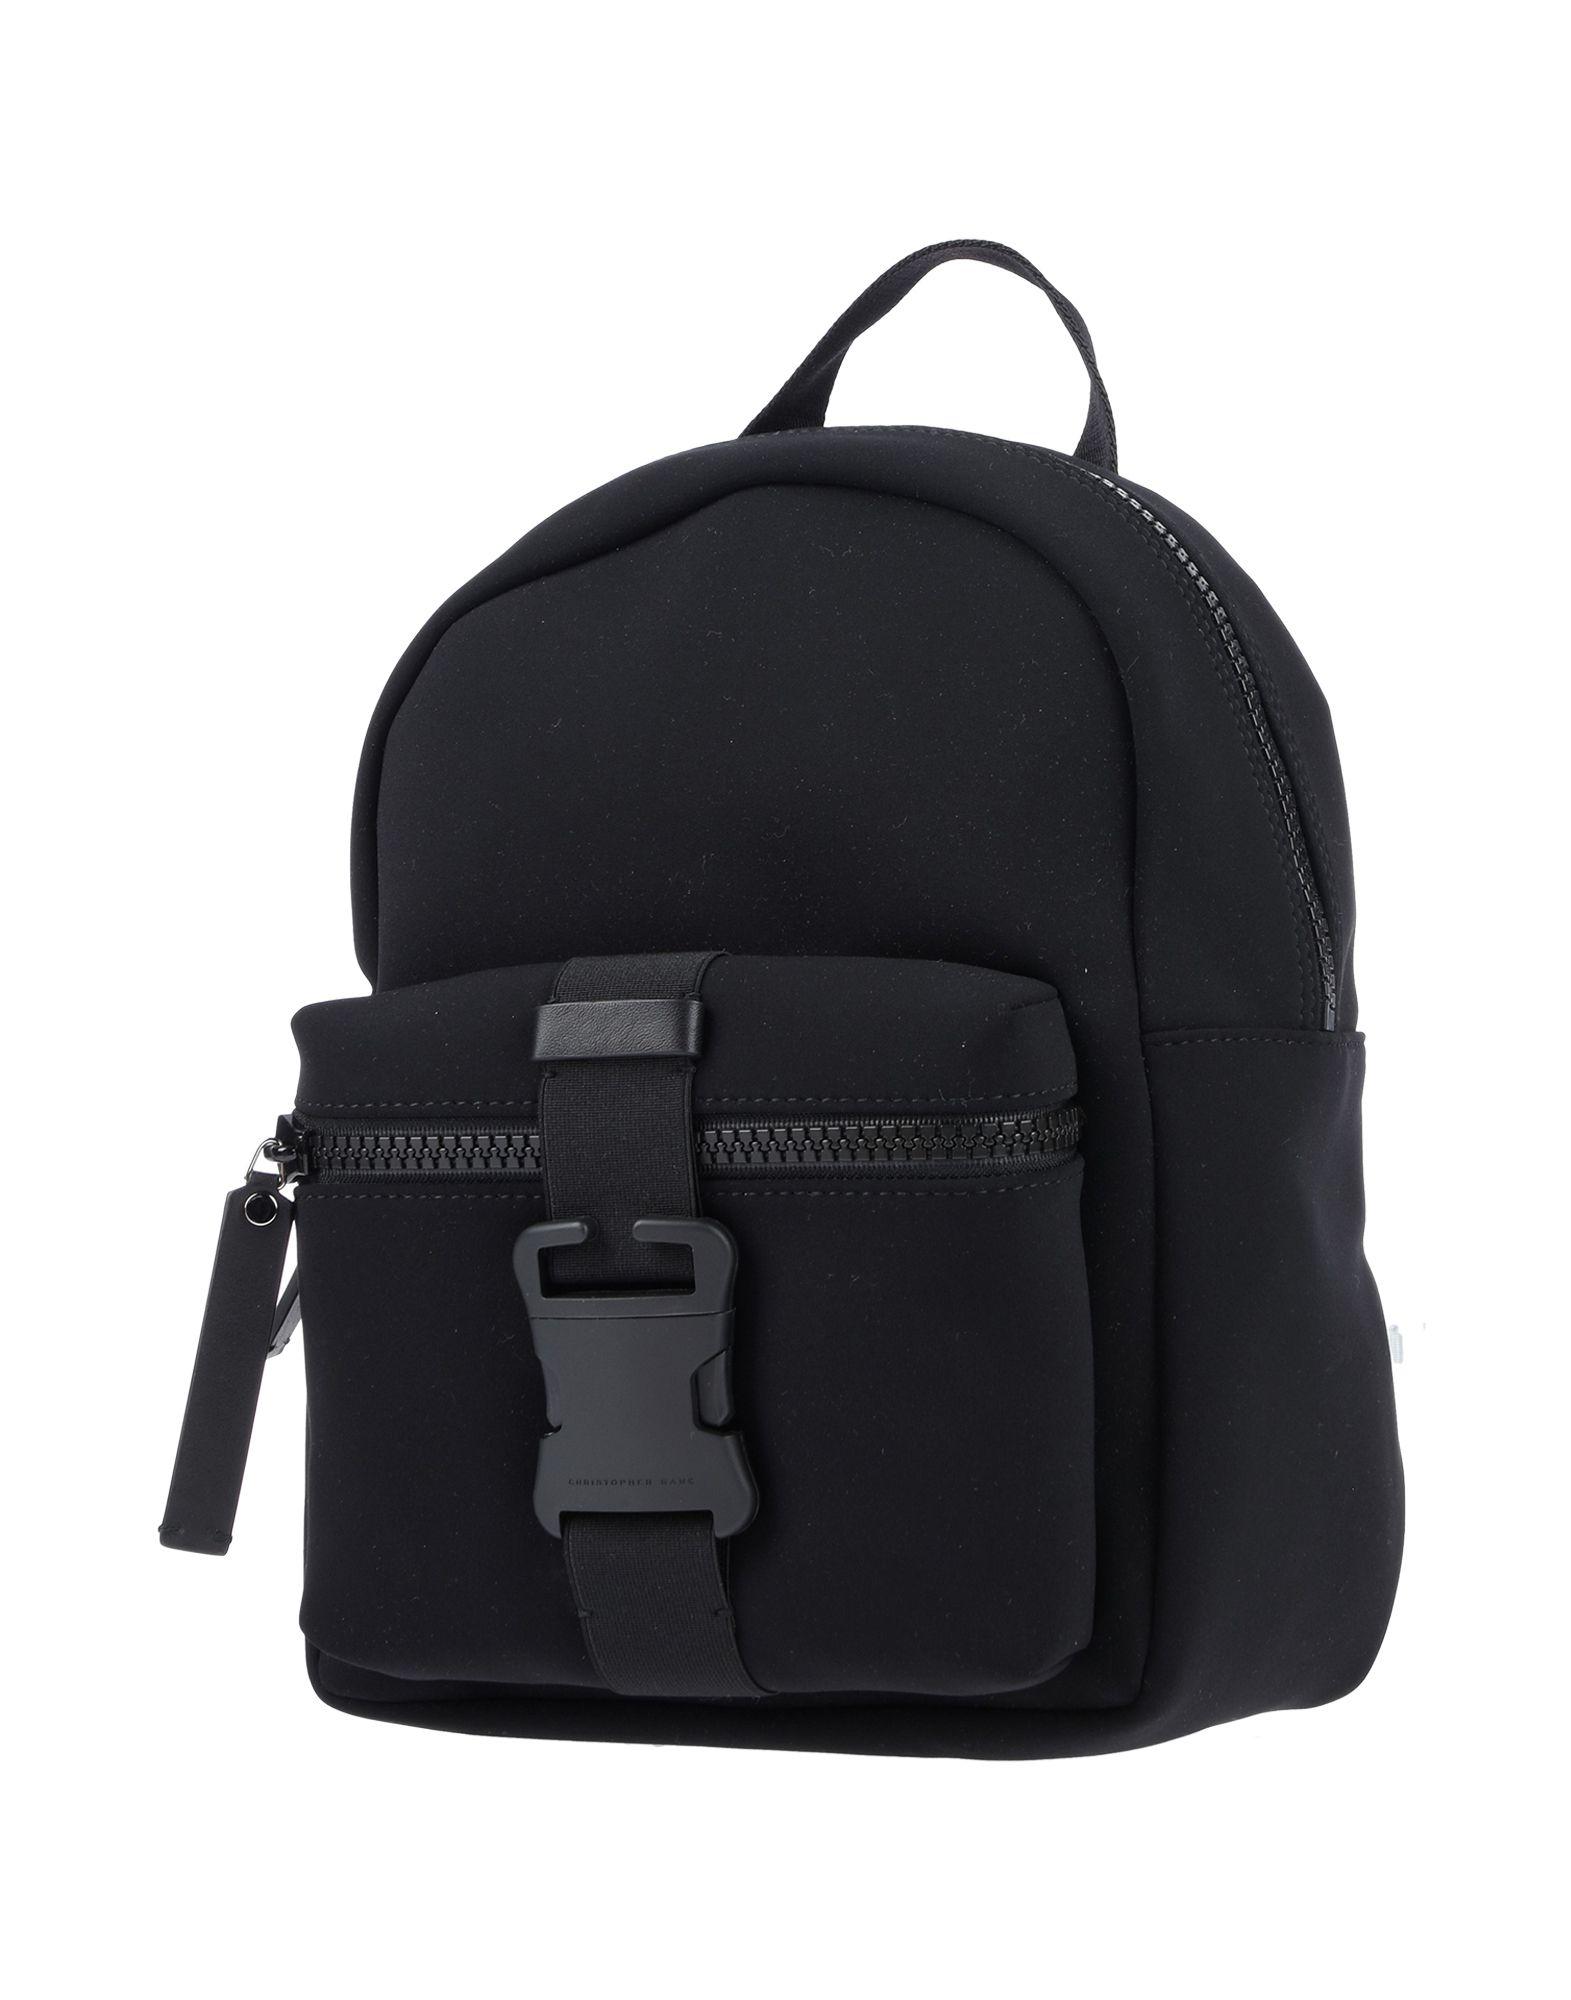 CHRISTOPHER KANE Рюкзаки и сумки на пояс christopher raeburn рюкзаки и сумки на пояс